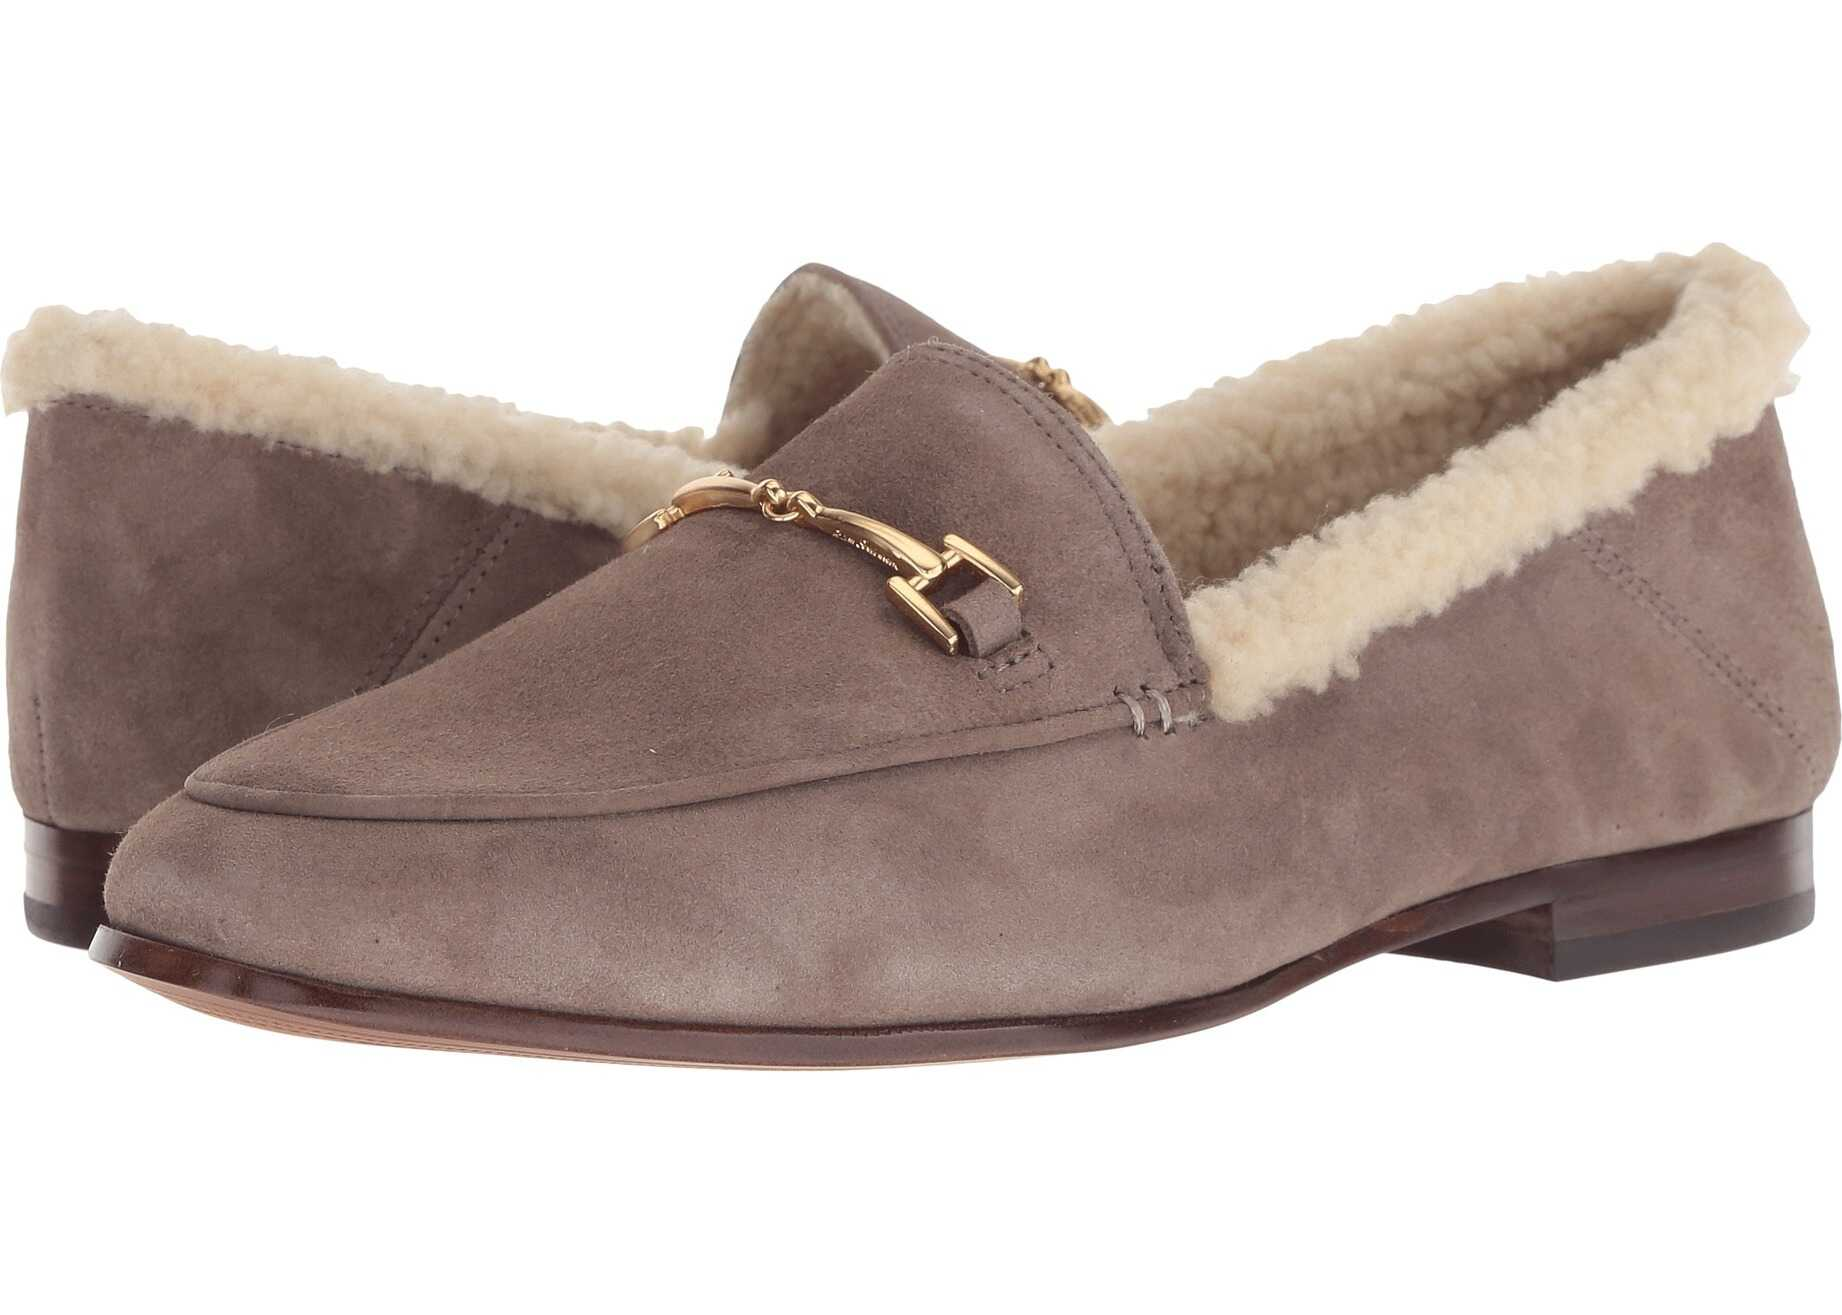 Sam Edelman Loraine Flint Grey/Natural Kid Suede Leather/Vegan Shearling Fur